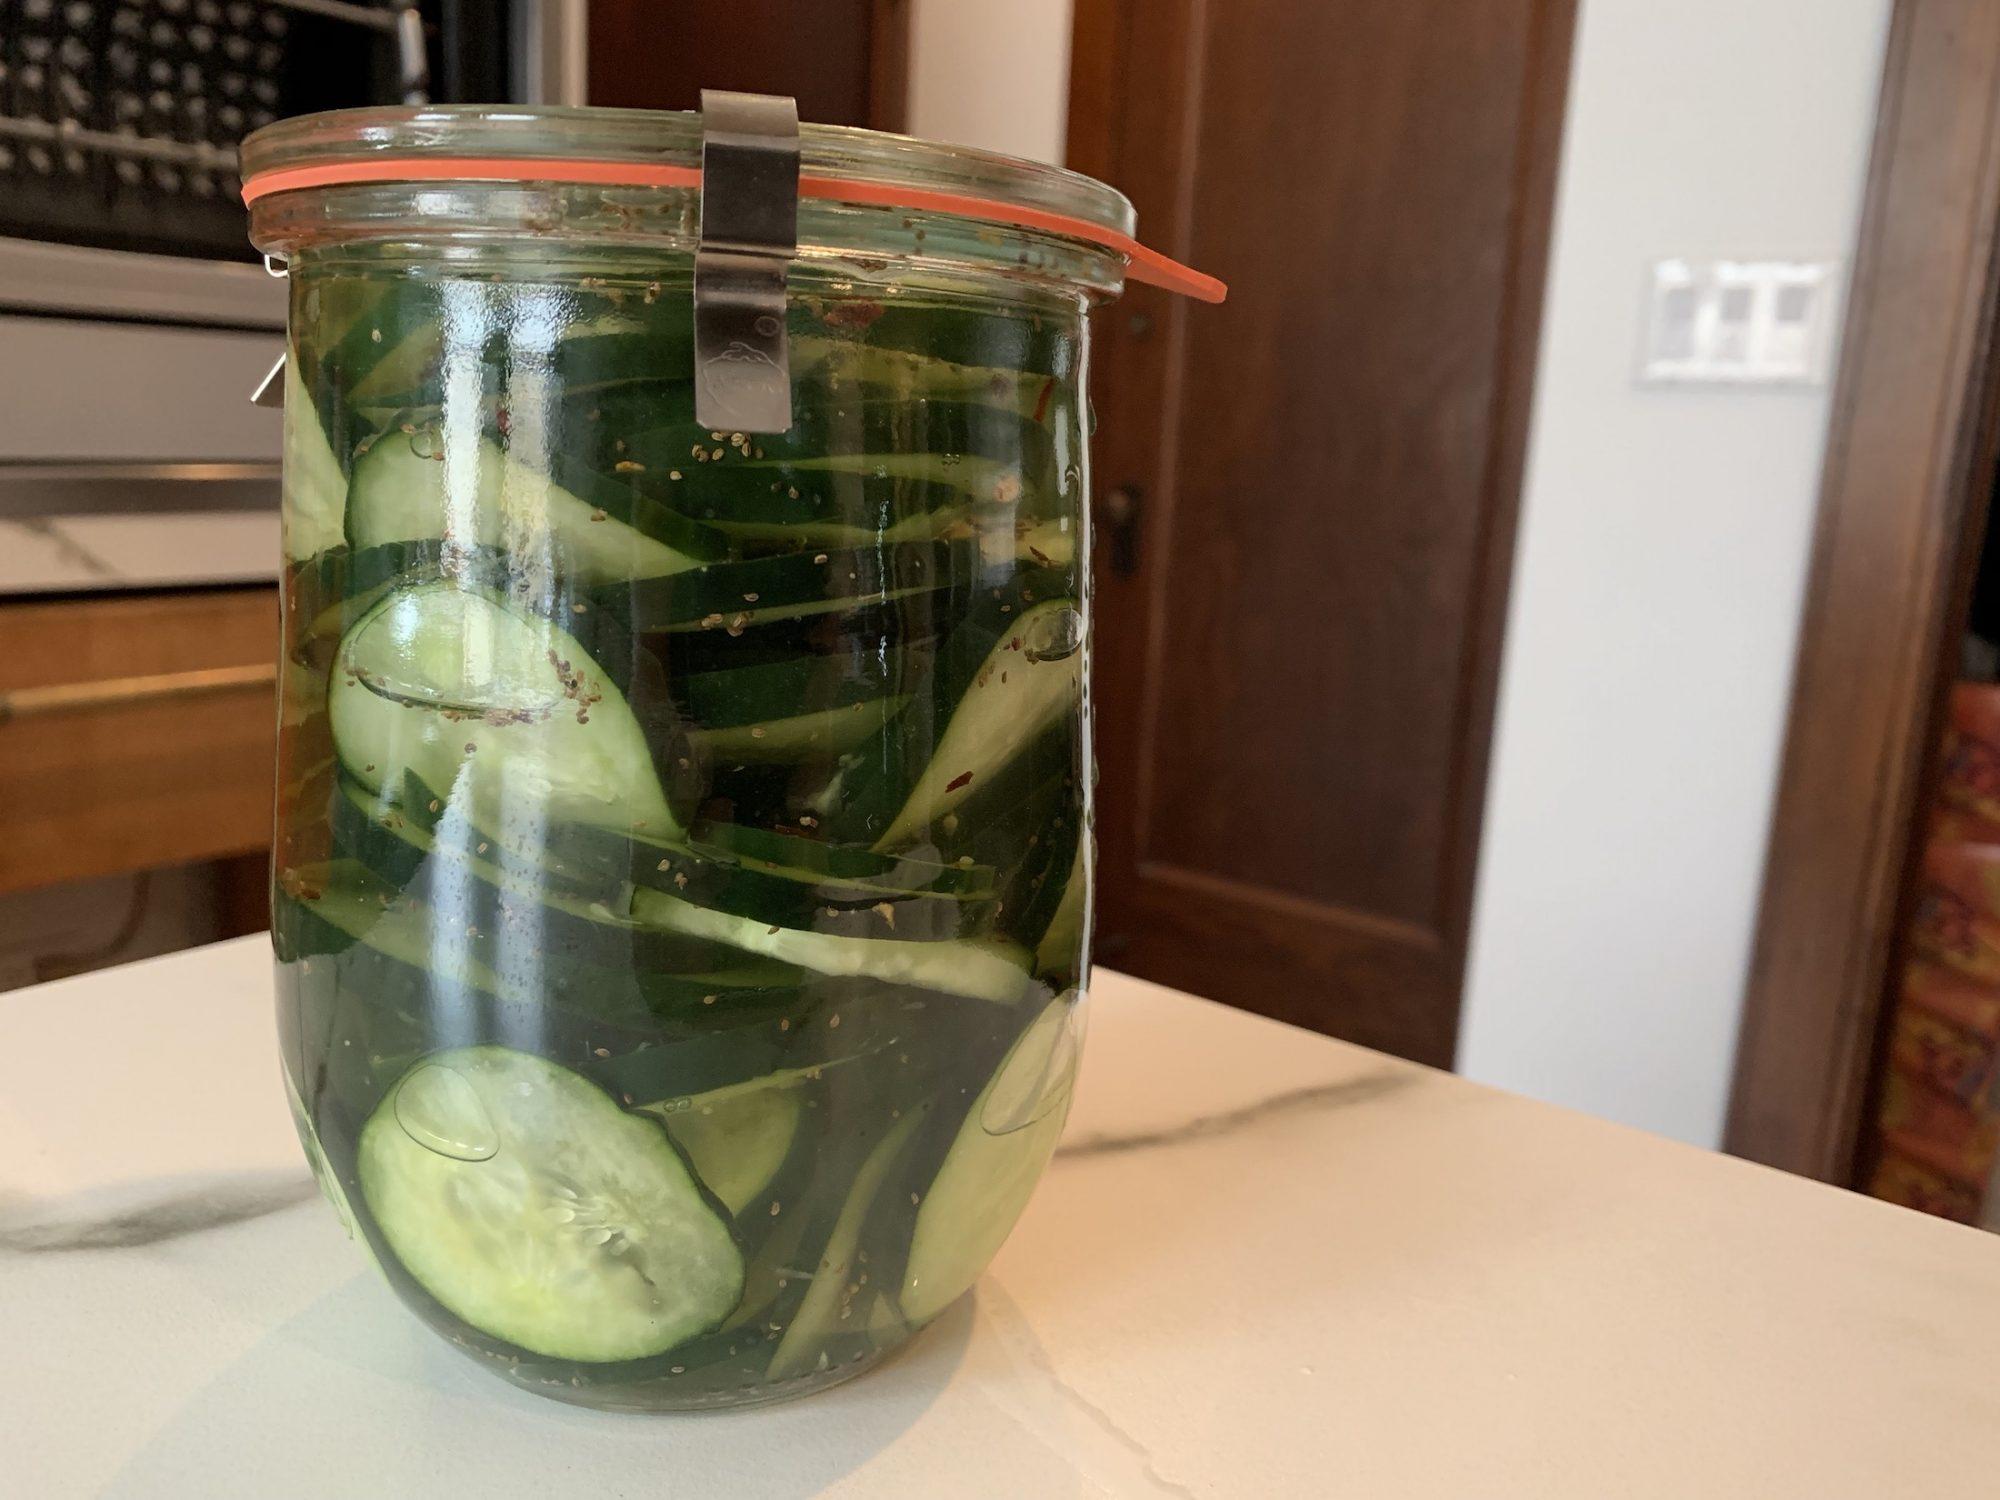 mr-quick cucumber pickles image.jpg